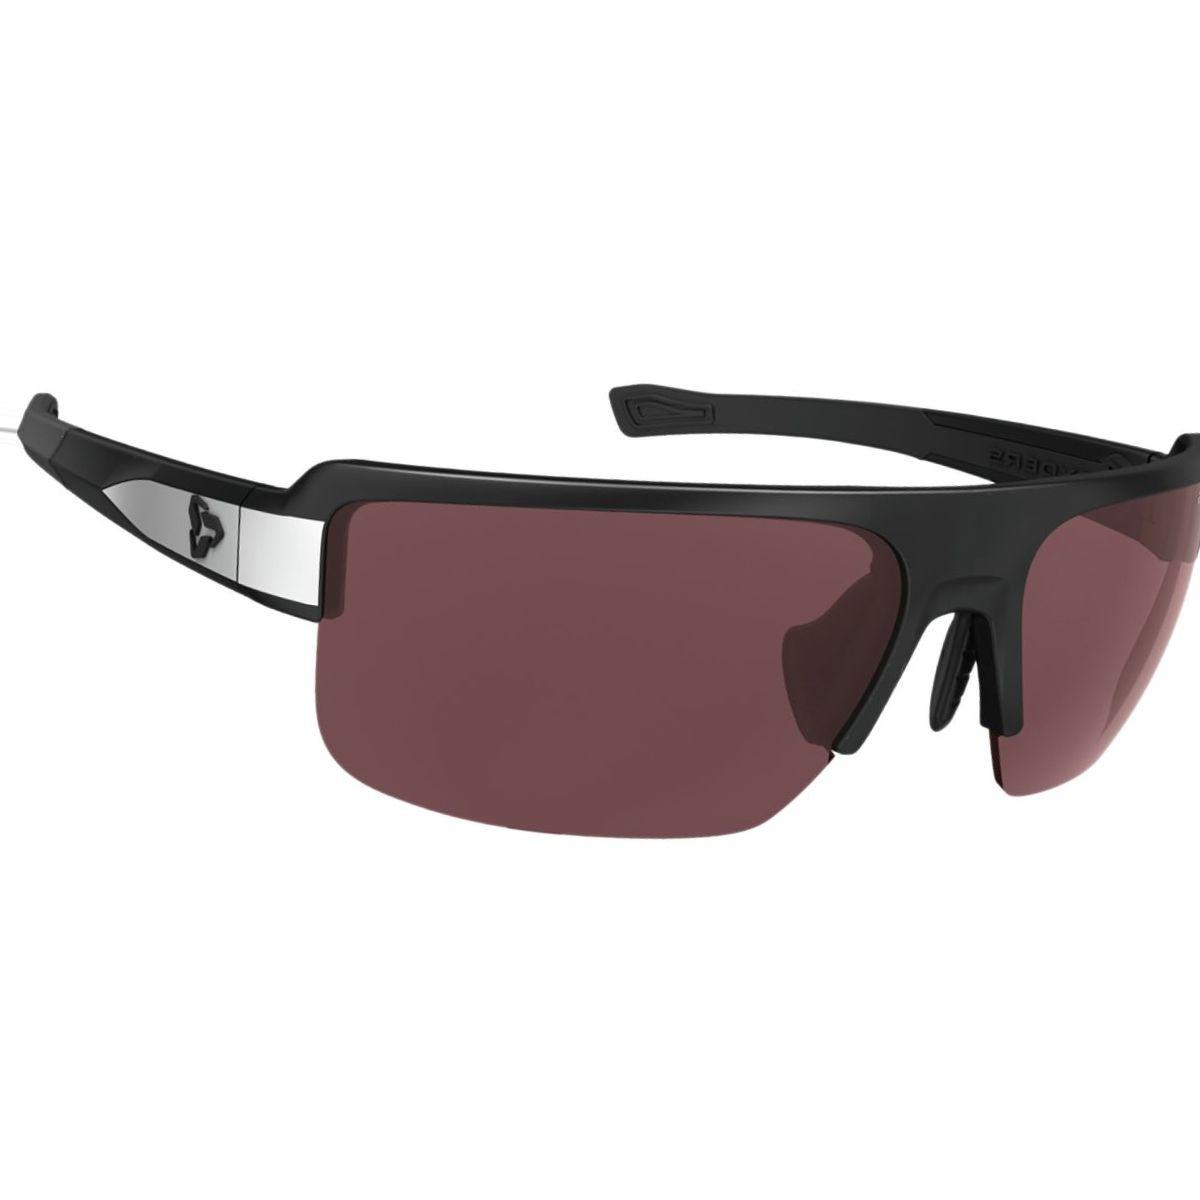 Ryders Eyewear Seventh Polarized Sunglasses - Men's